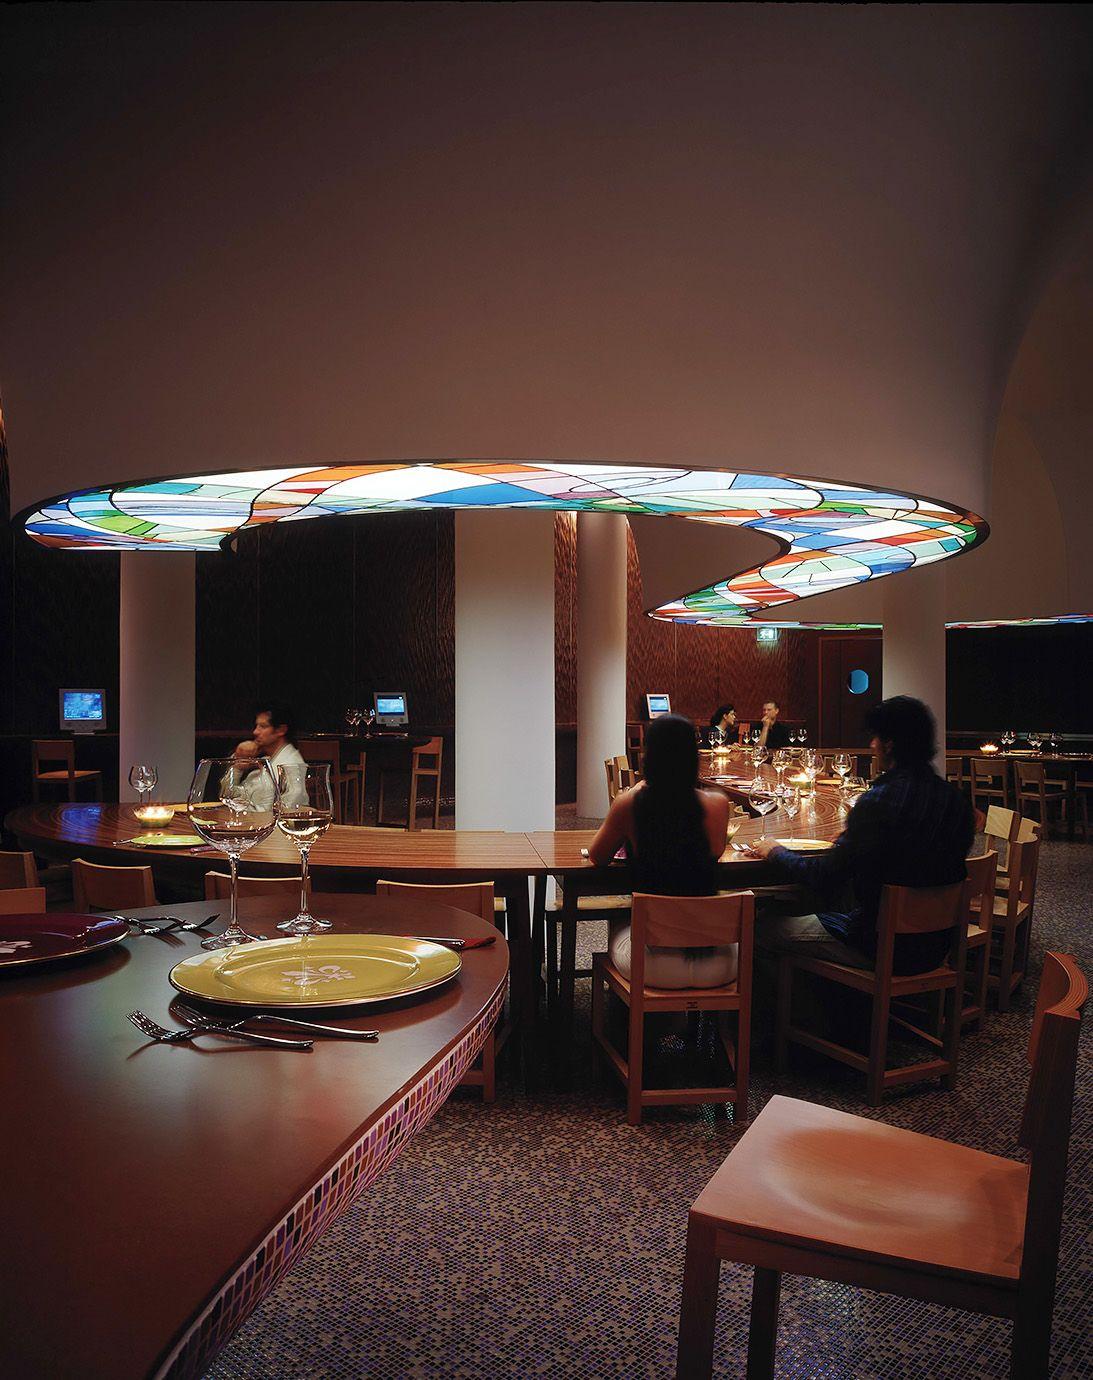 fabio novembre - una hotel vittoria | exhibit | pinterest | hotels